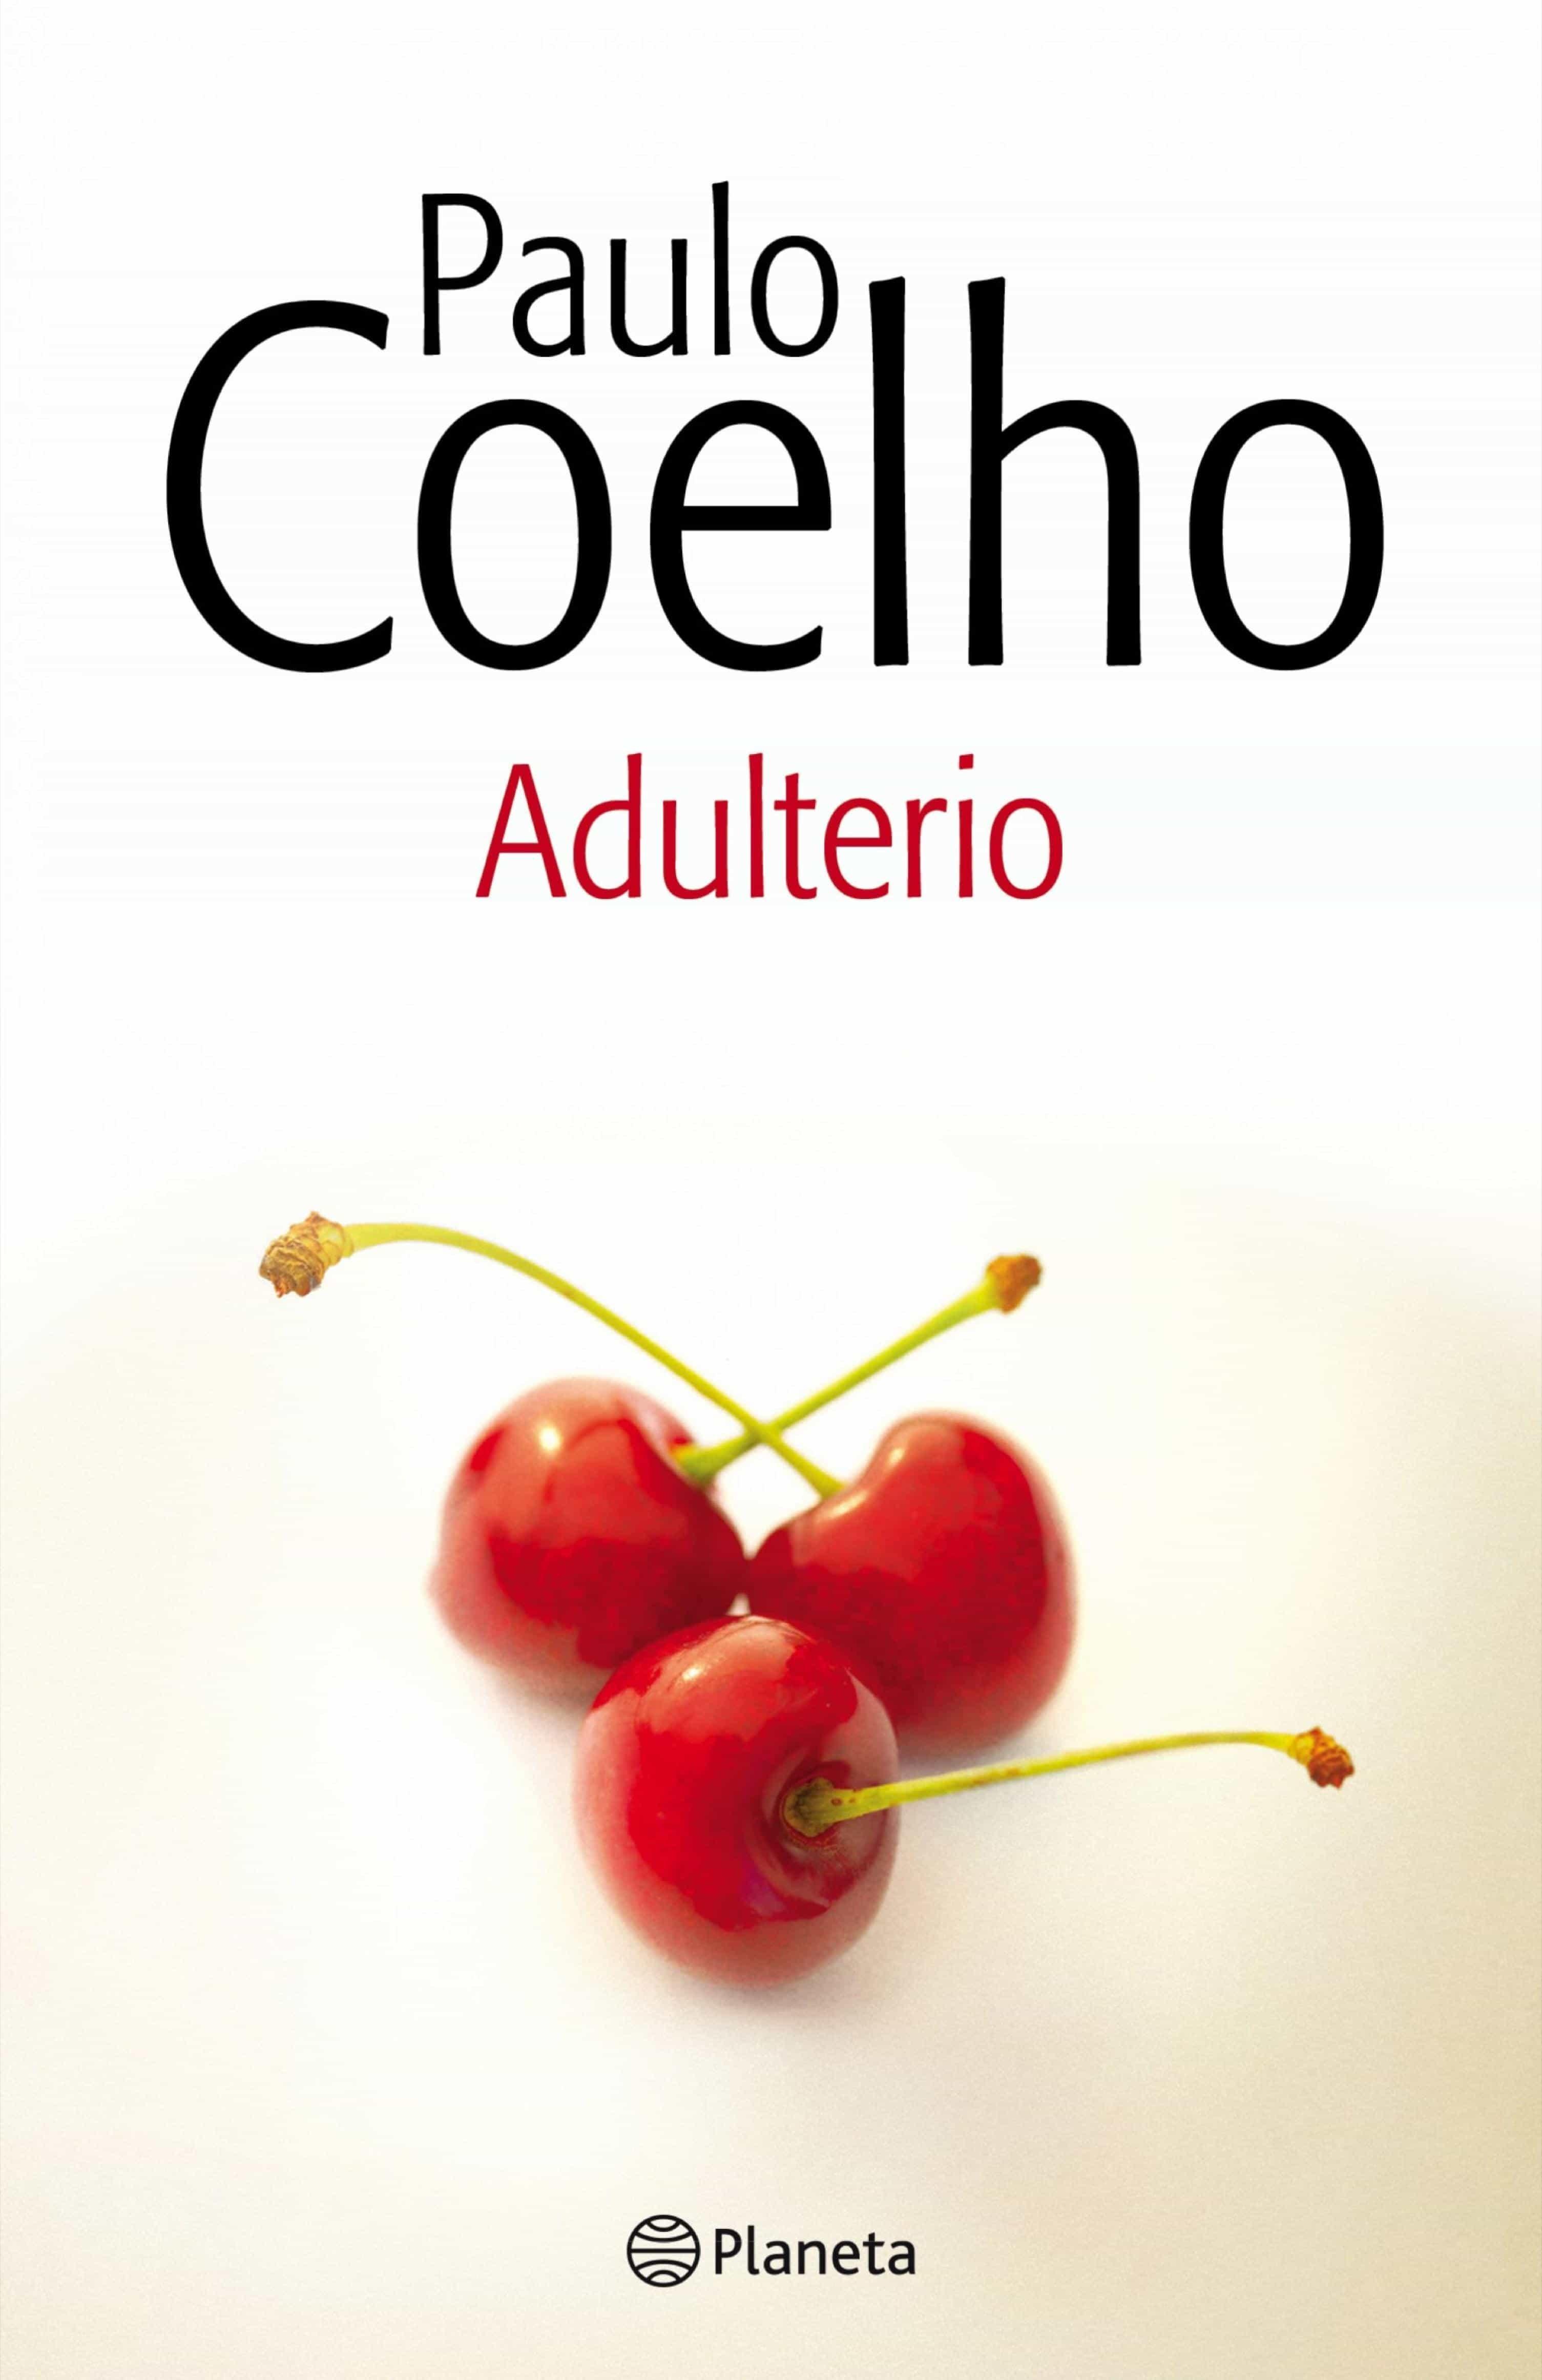 Adulterio ebook paulo coelho 9788408132585